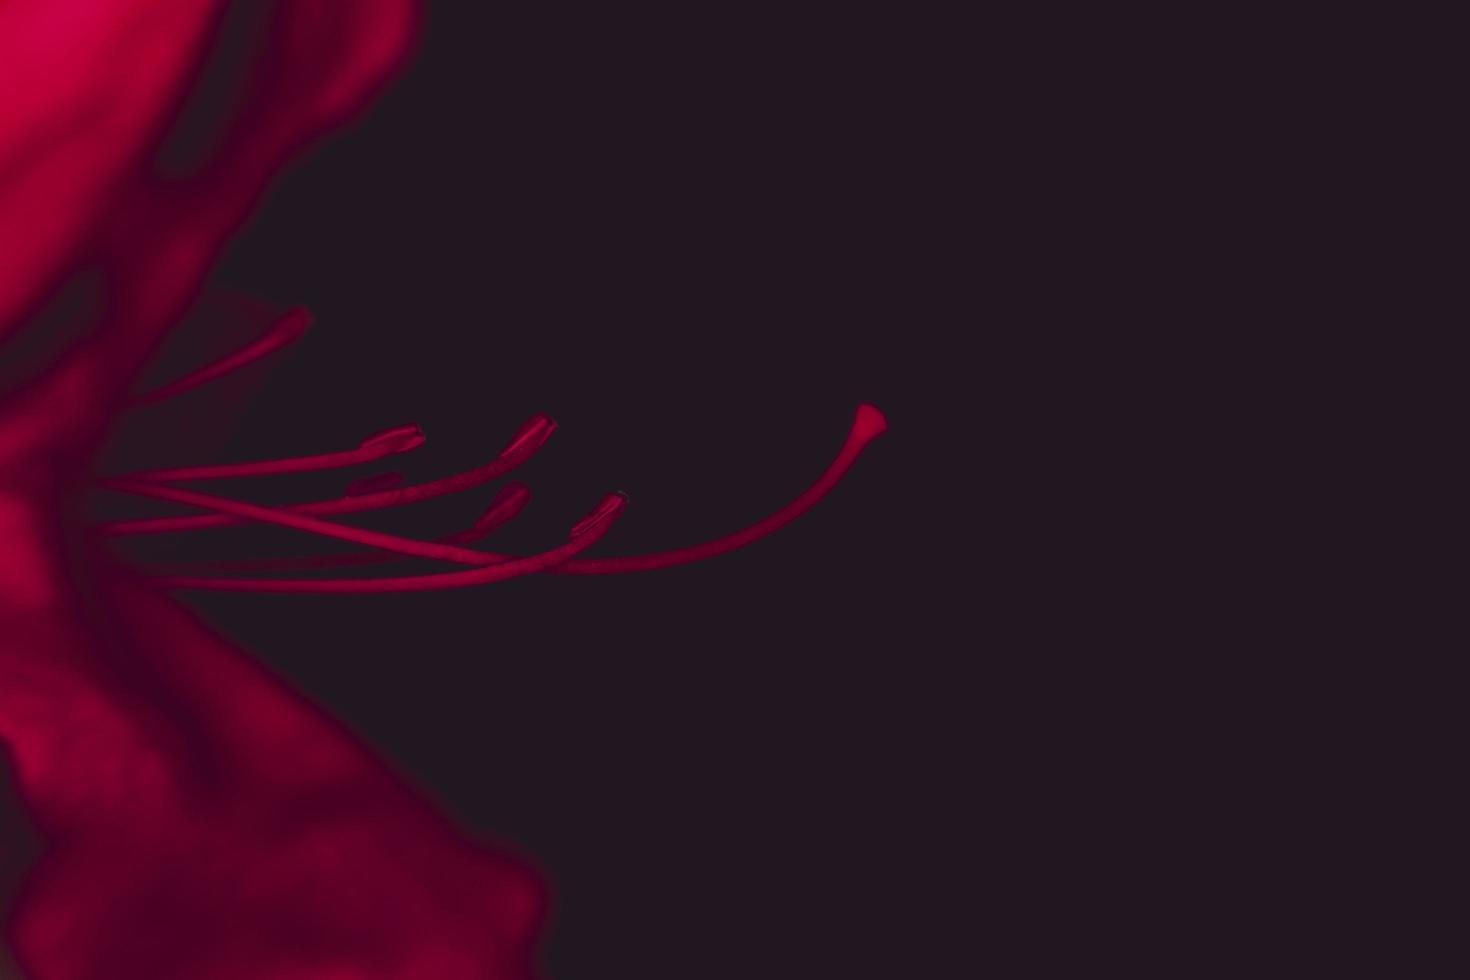 étamine de fleur d'azalée photo